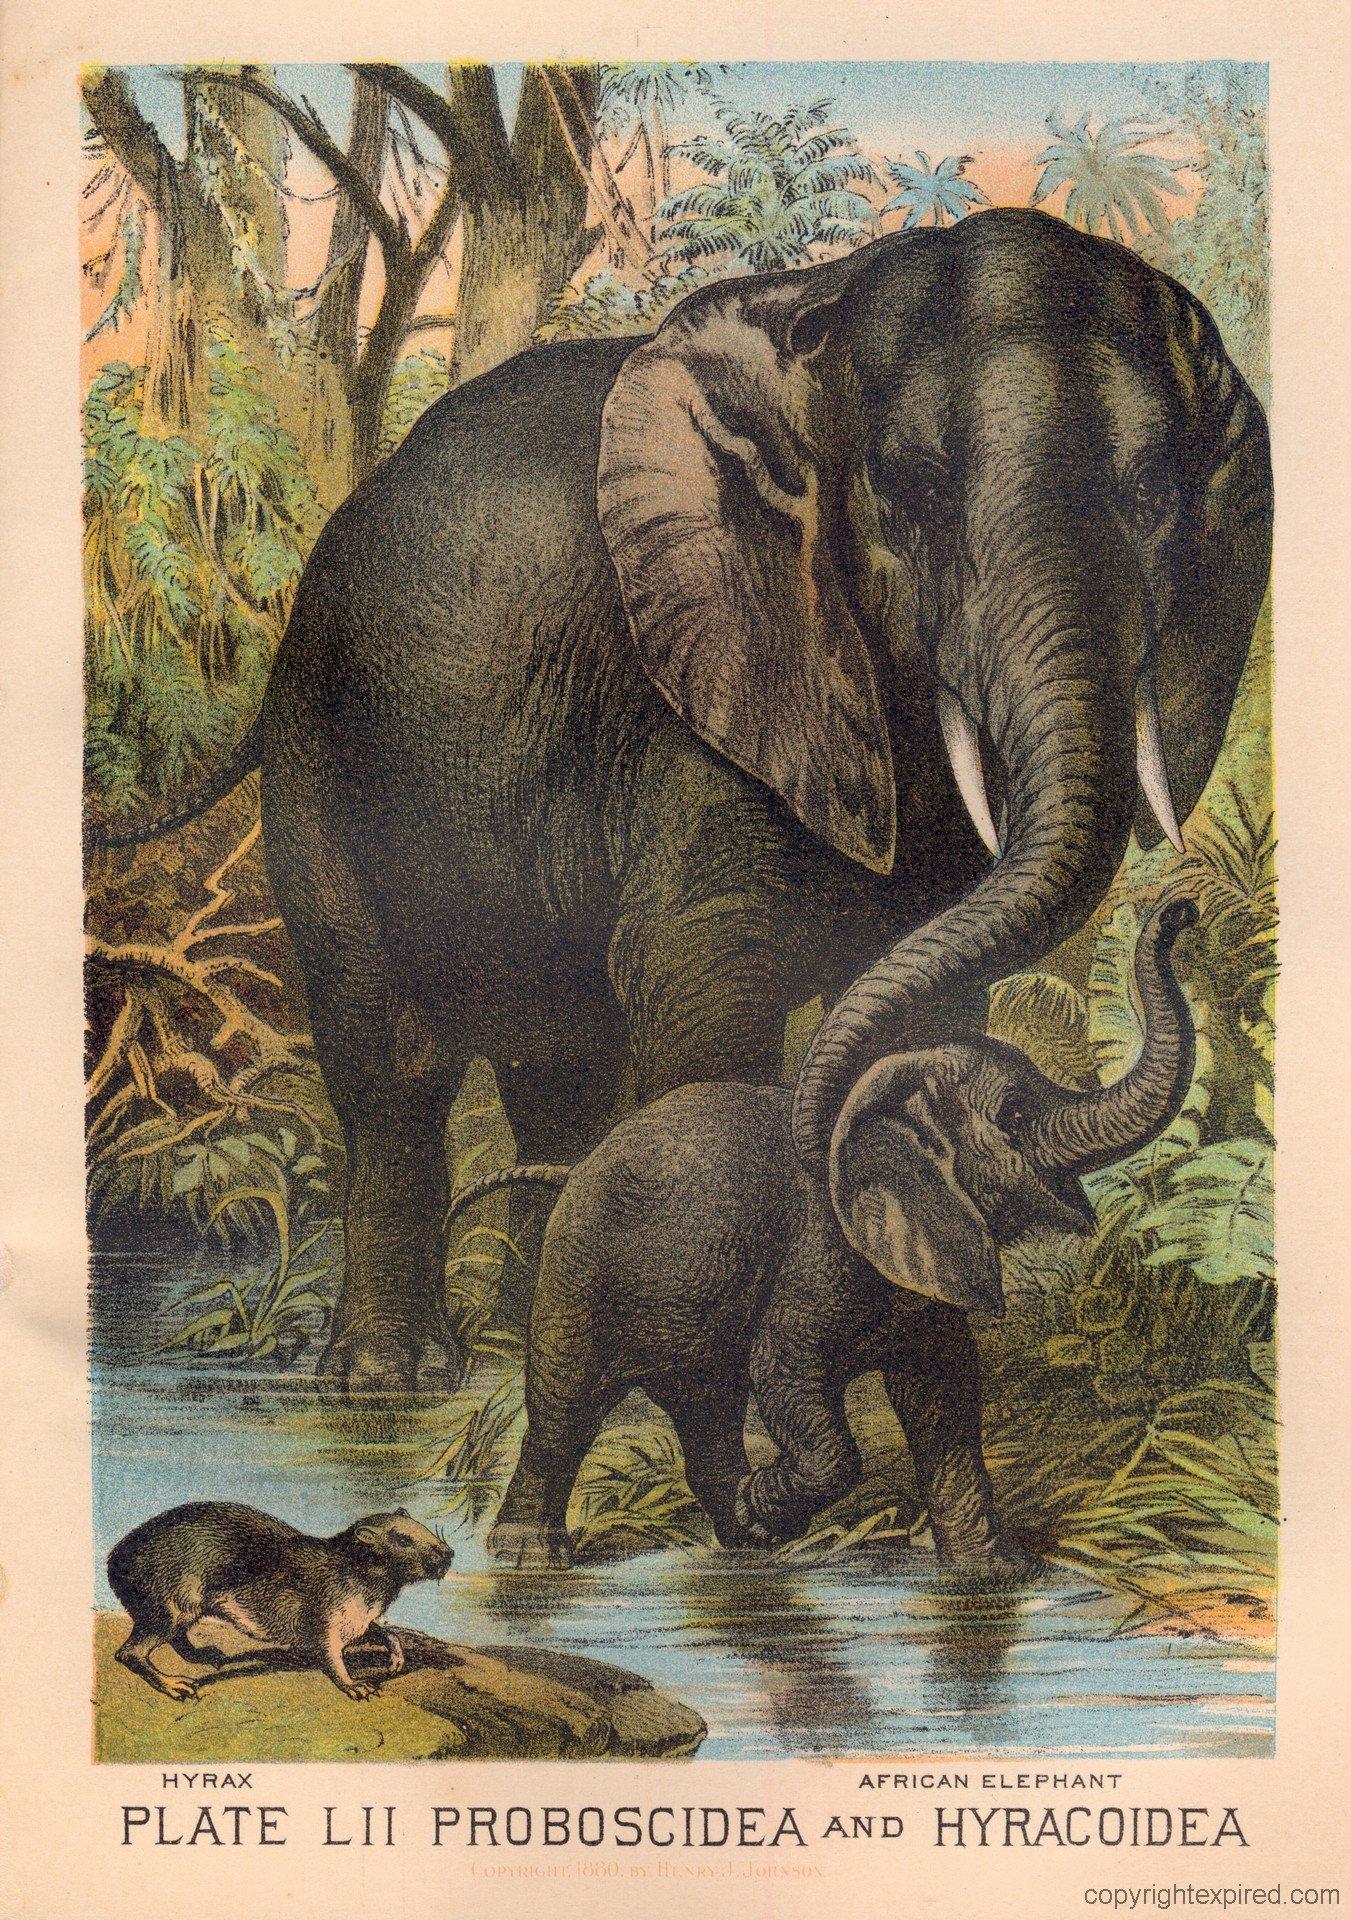 Hyrax elephant